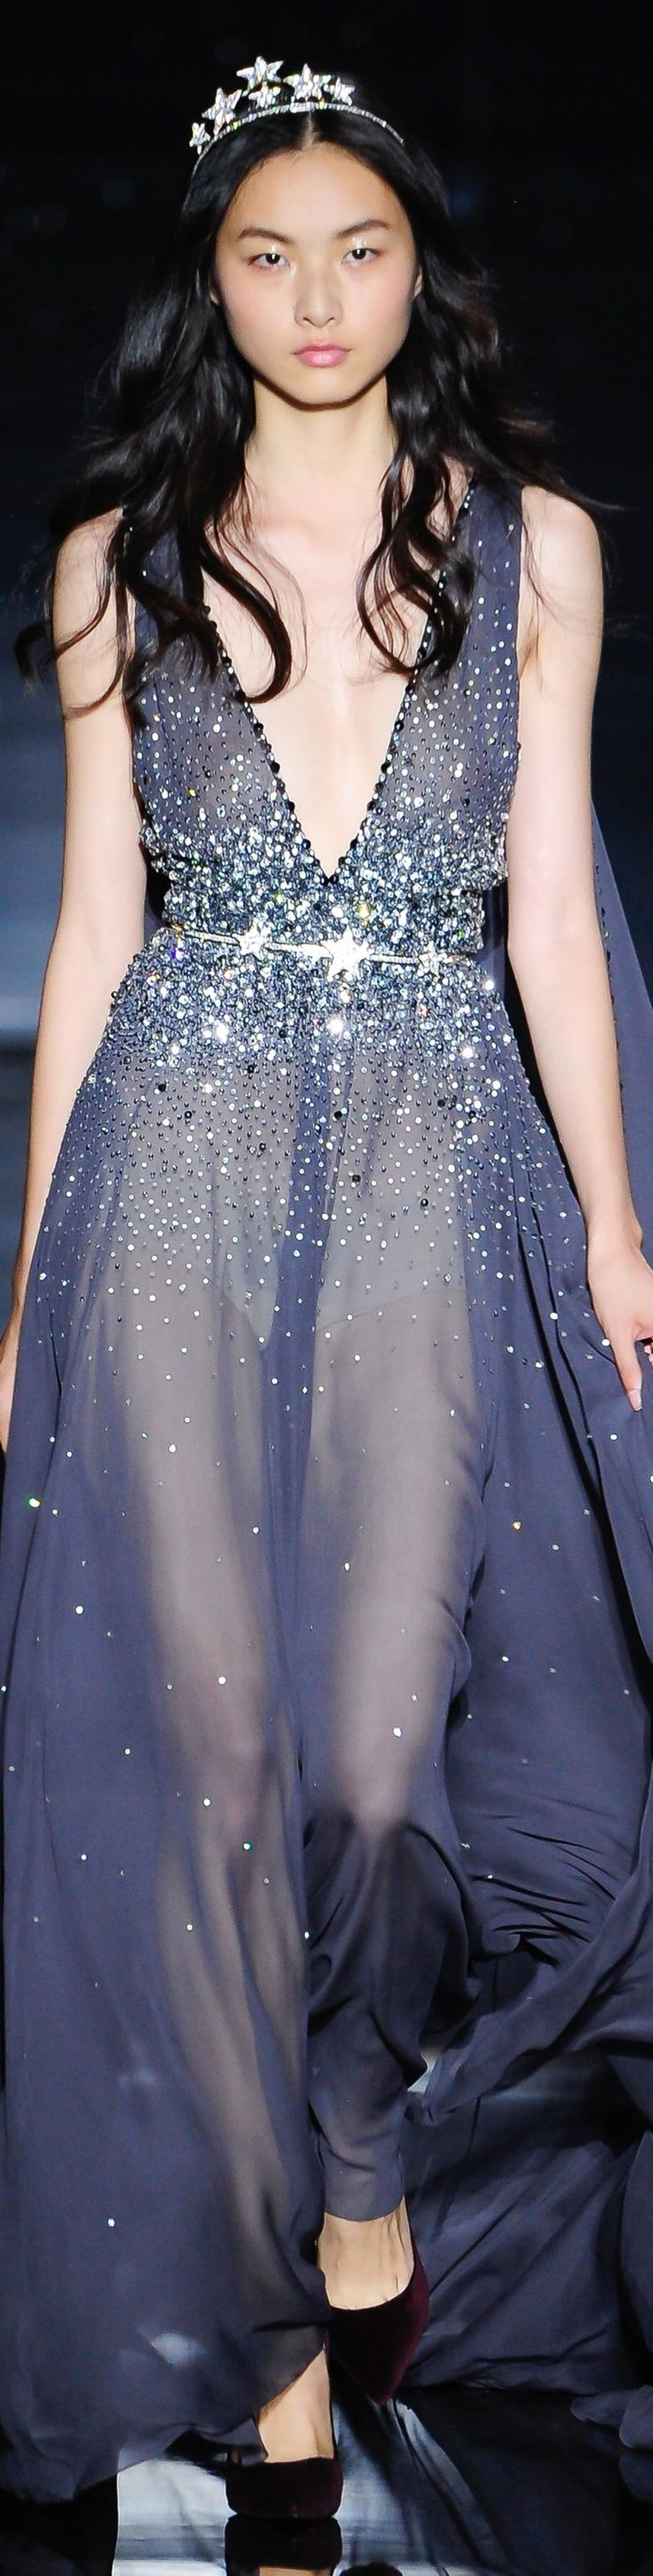 Zuhair Murad FW 2015 couture